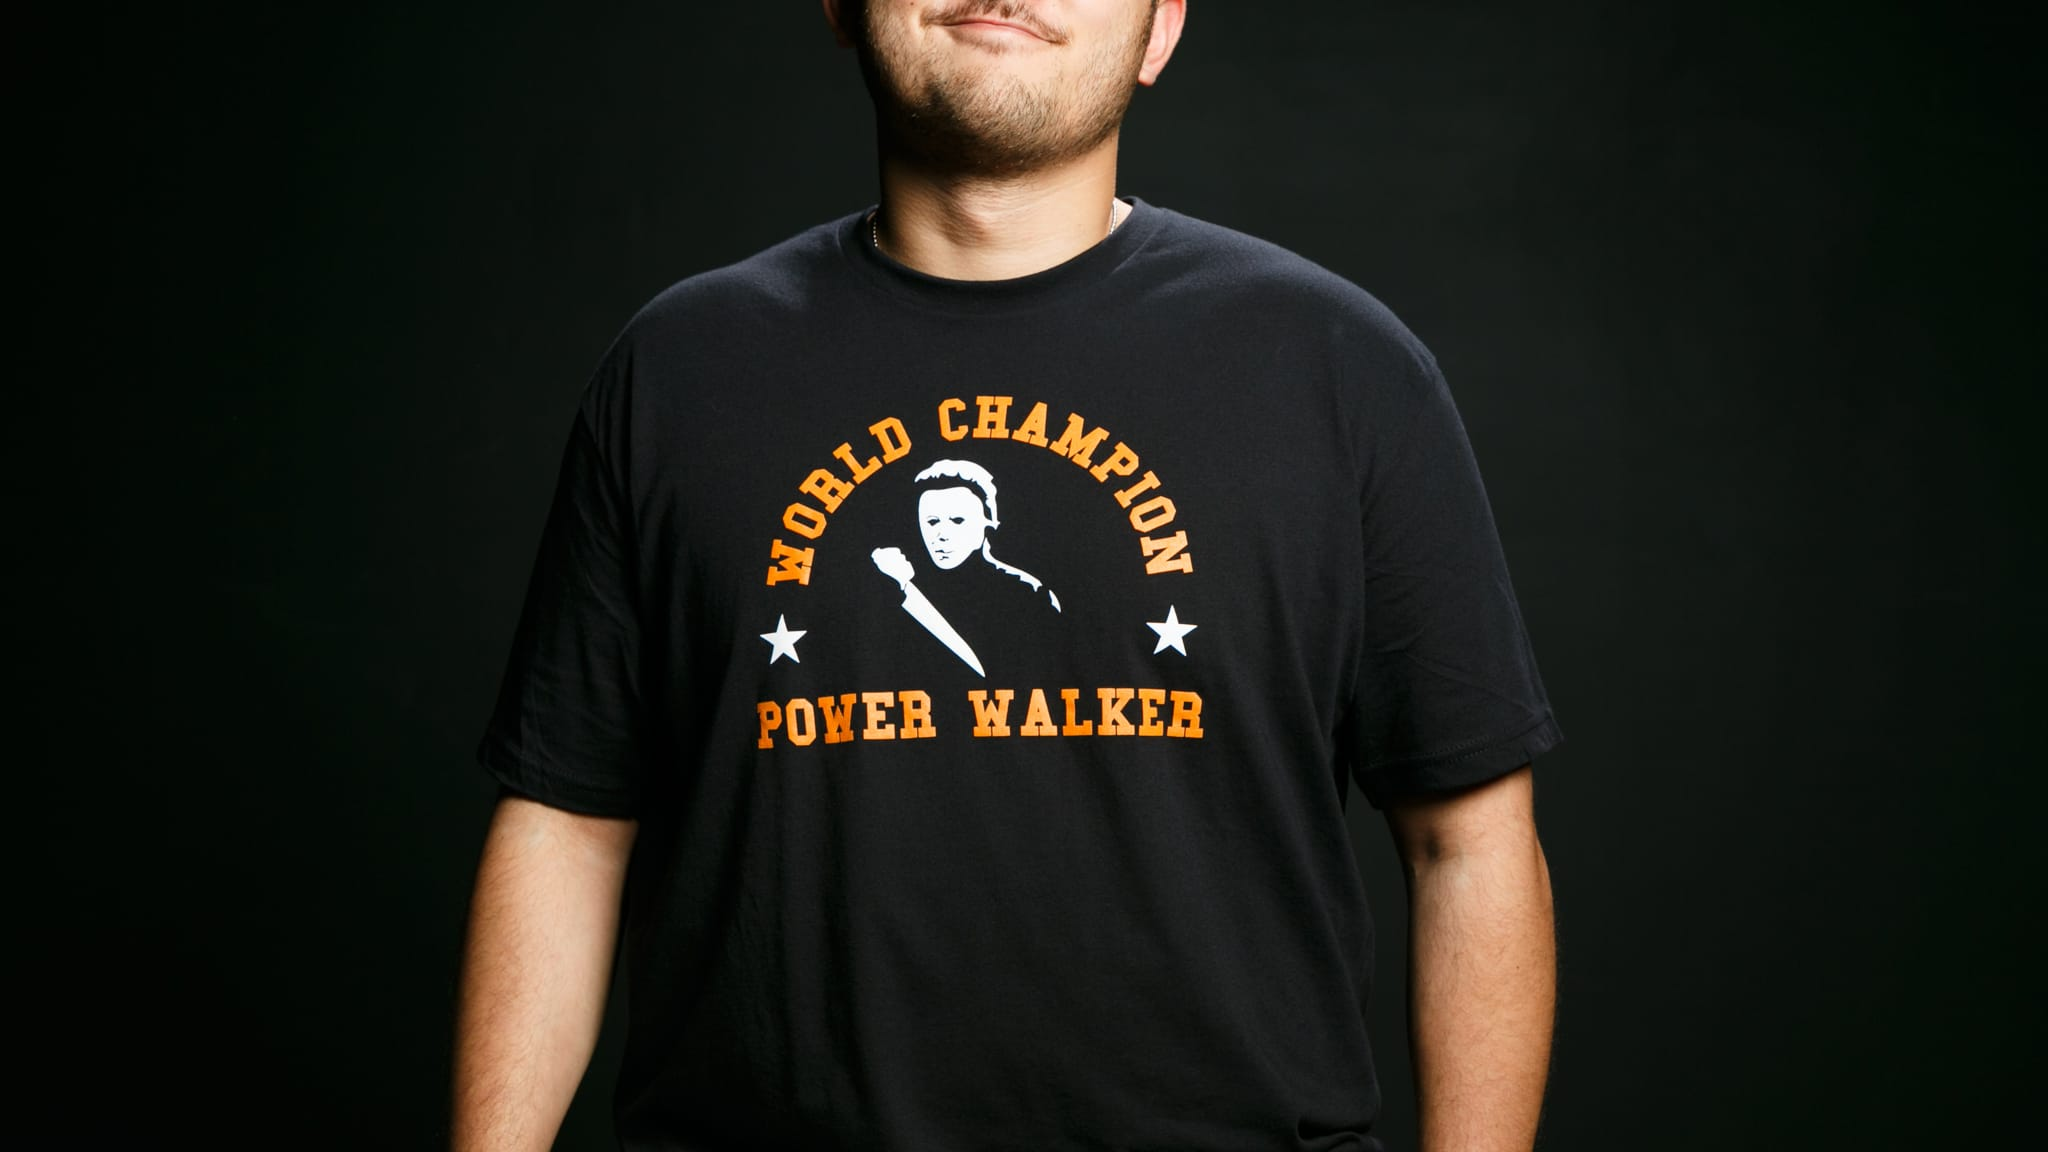 Power Walker Tee